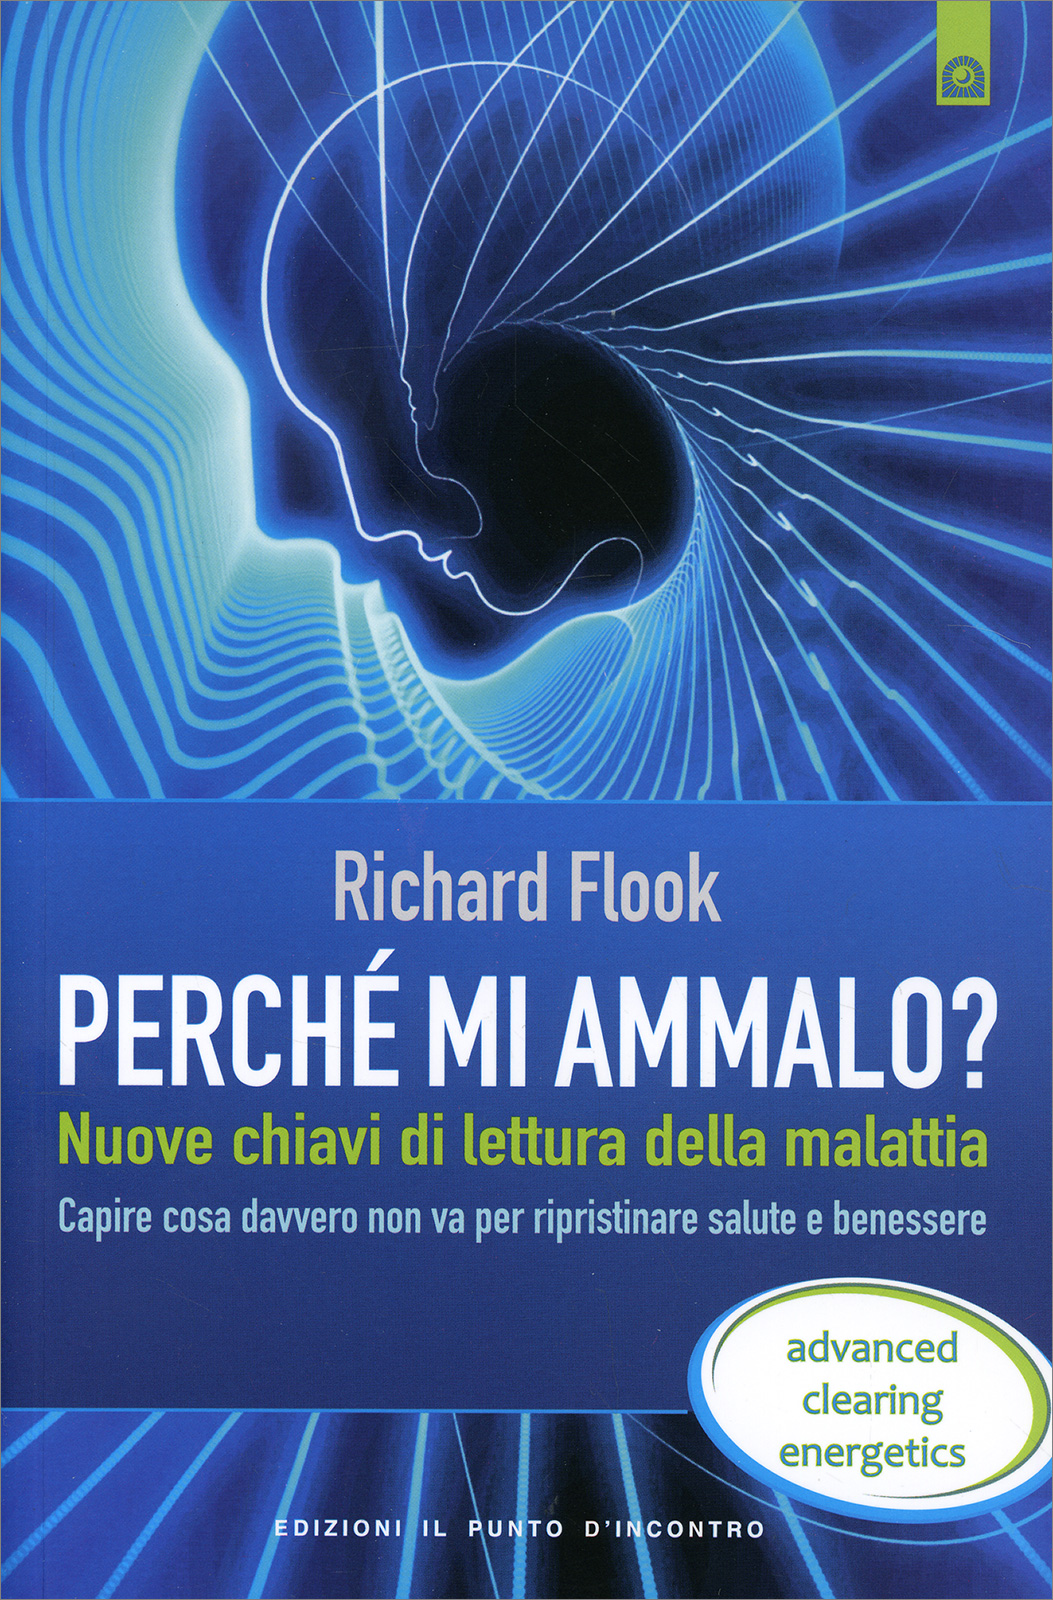 Perche Mi Ammalo Richard Flook Libro